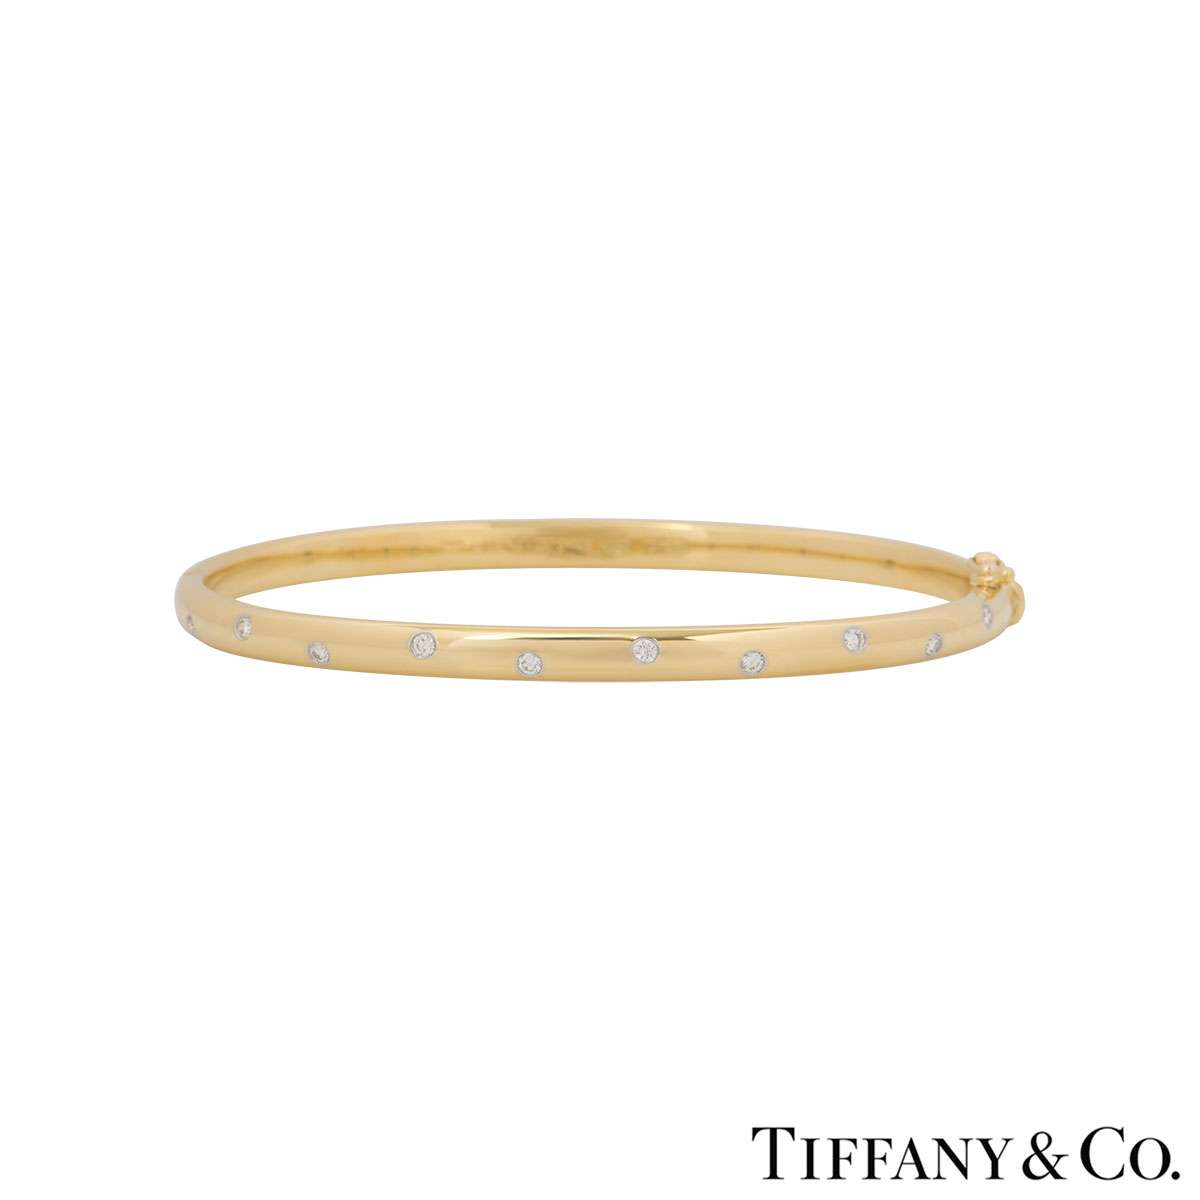 Tiffany & Co. Yellow Gold Etoile Diamond Bangle